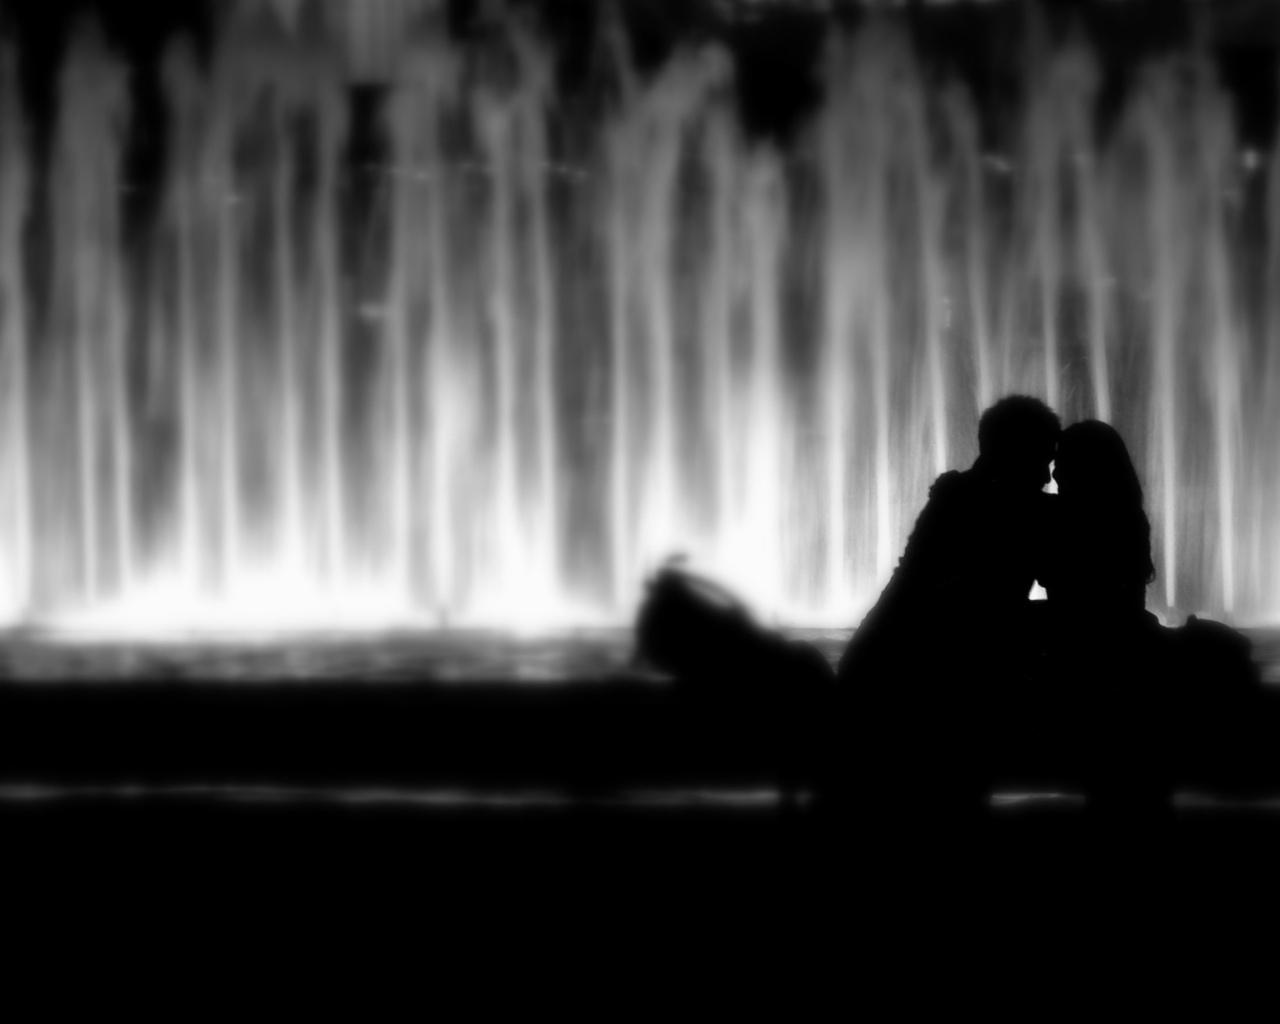 поцелуи, mood, парочка, pair, Lovers, влюблённые, couple, kiss, любовь, поцелуй, настроение, объятия, hug